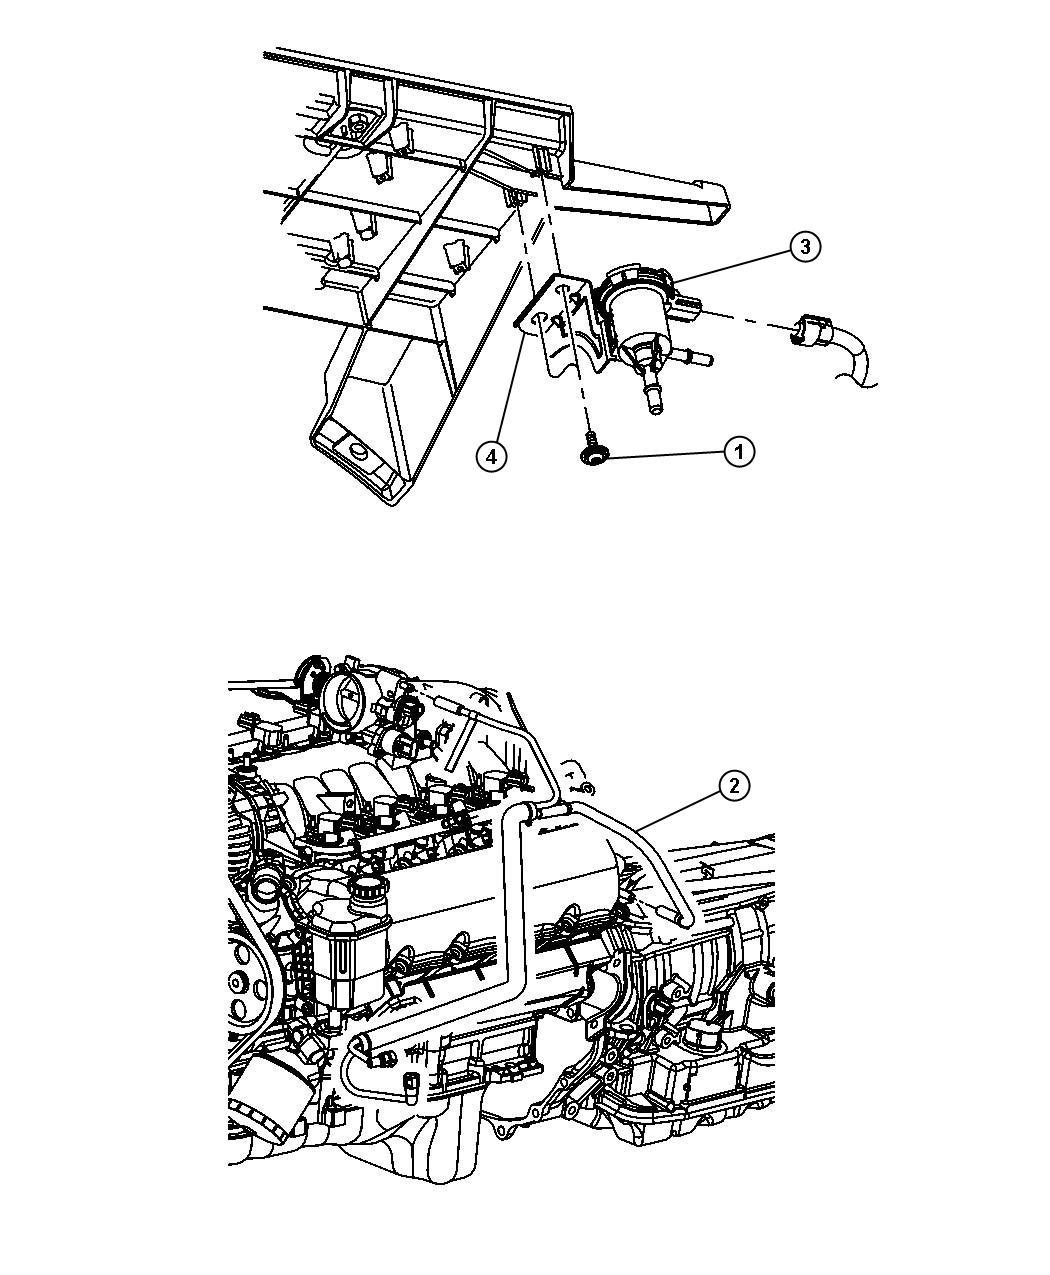 Dodge Ram 1500 Valve. Linear purge. Without bracket